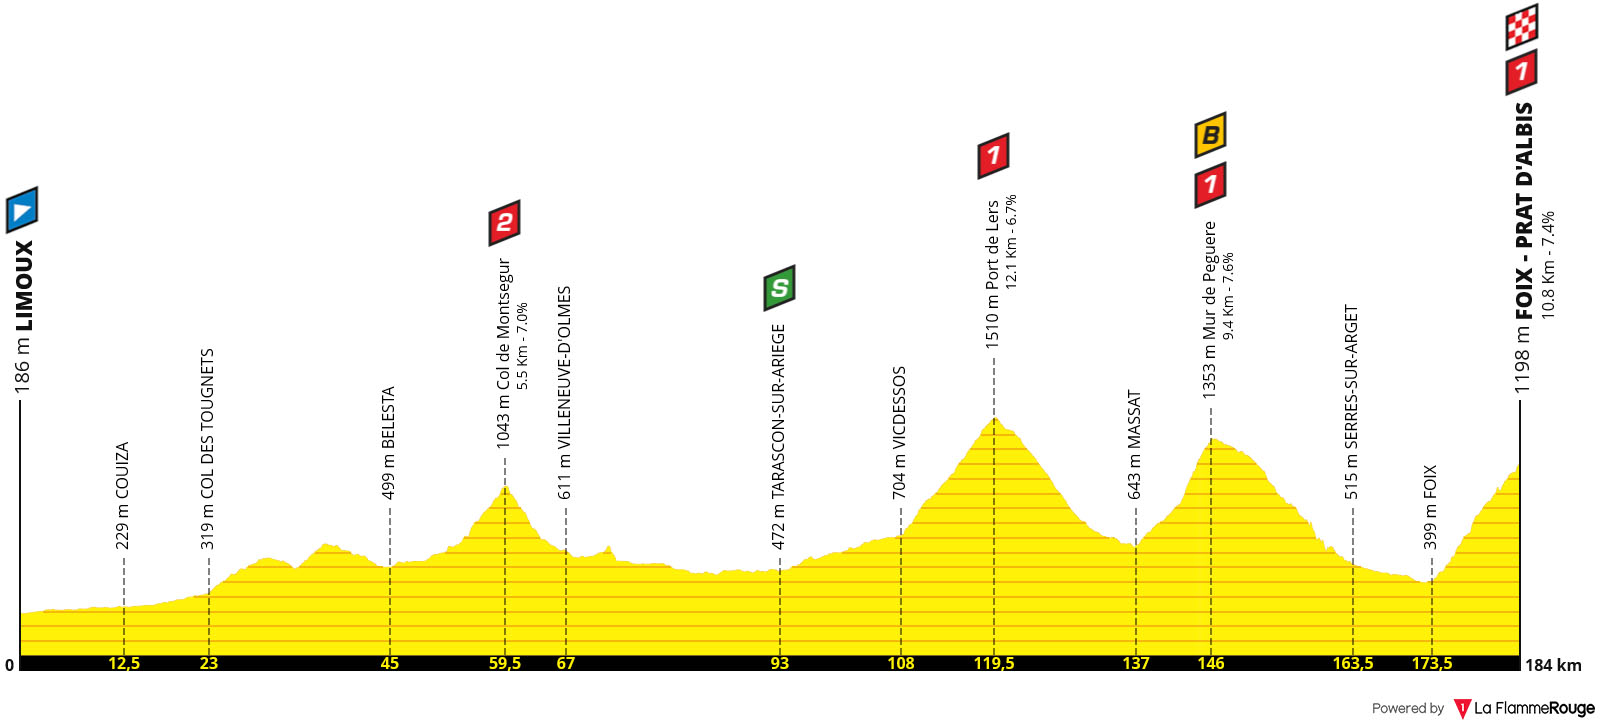 Perfil Etapa 15 - Tour de Francia 2019